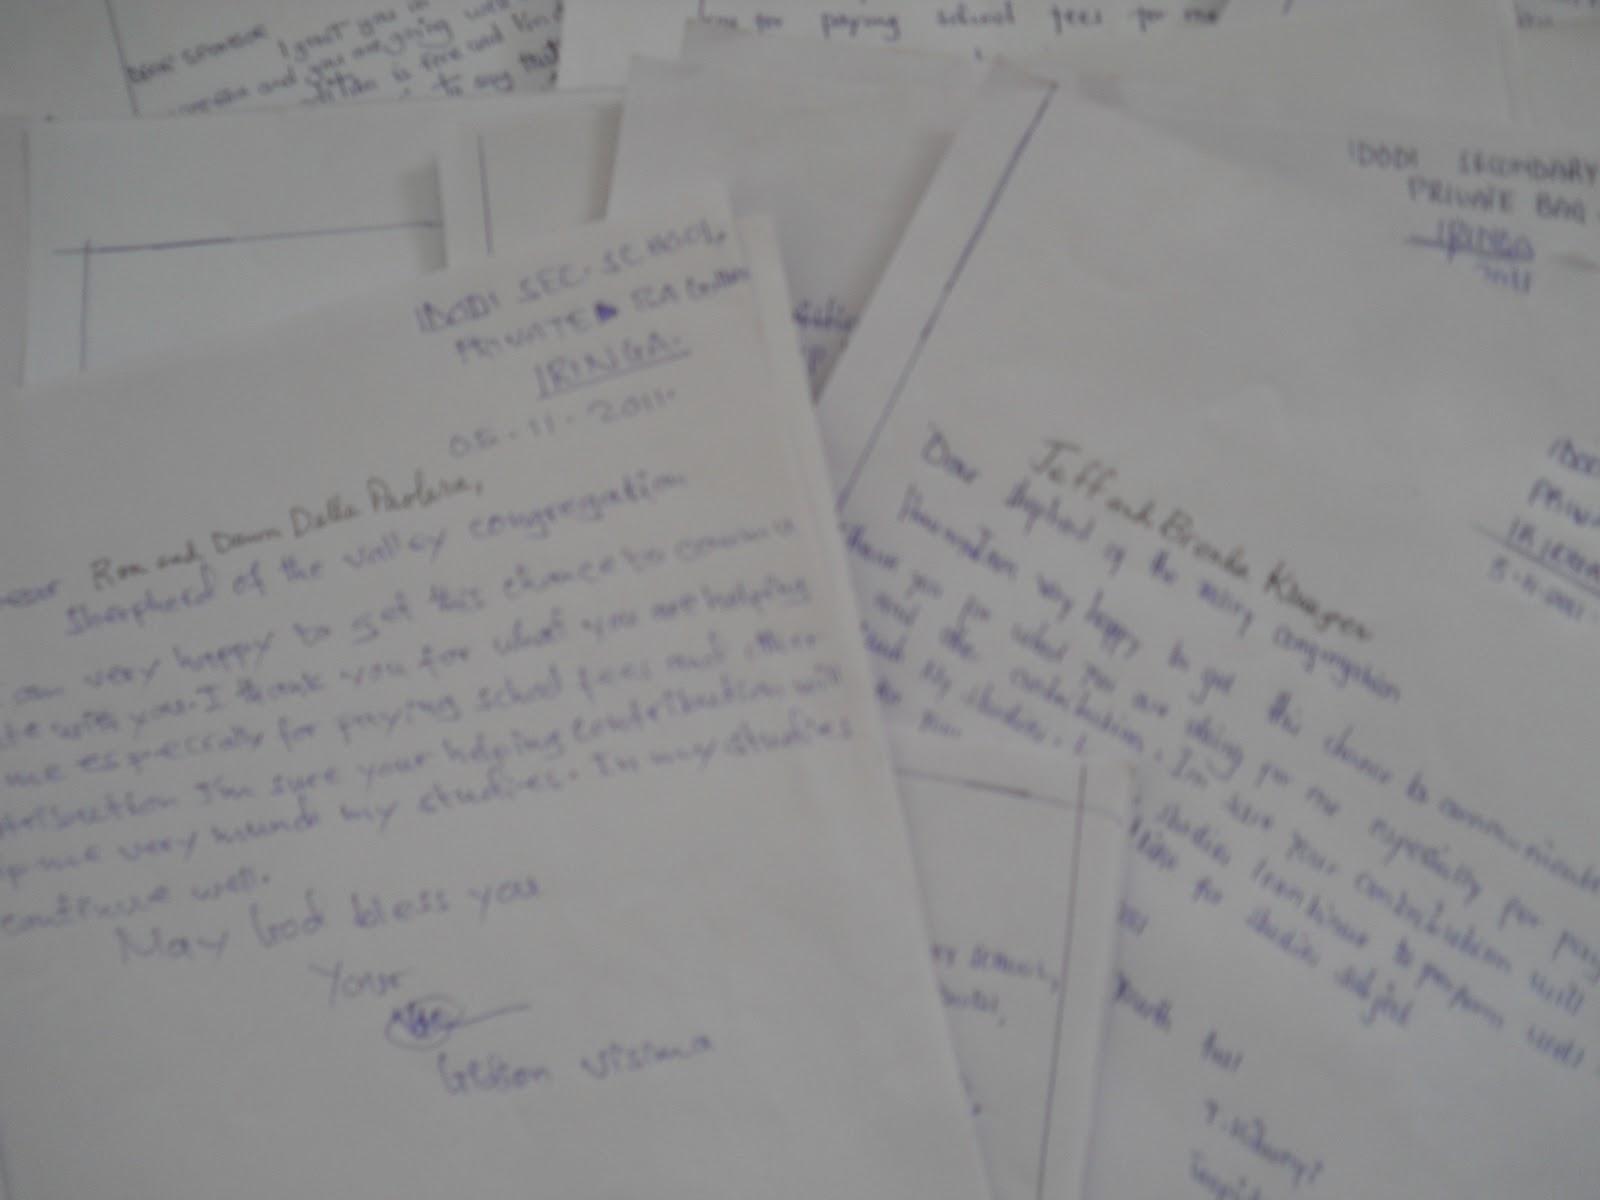 Tanzania Partnership: Letters